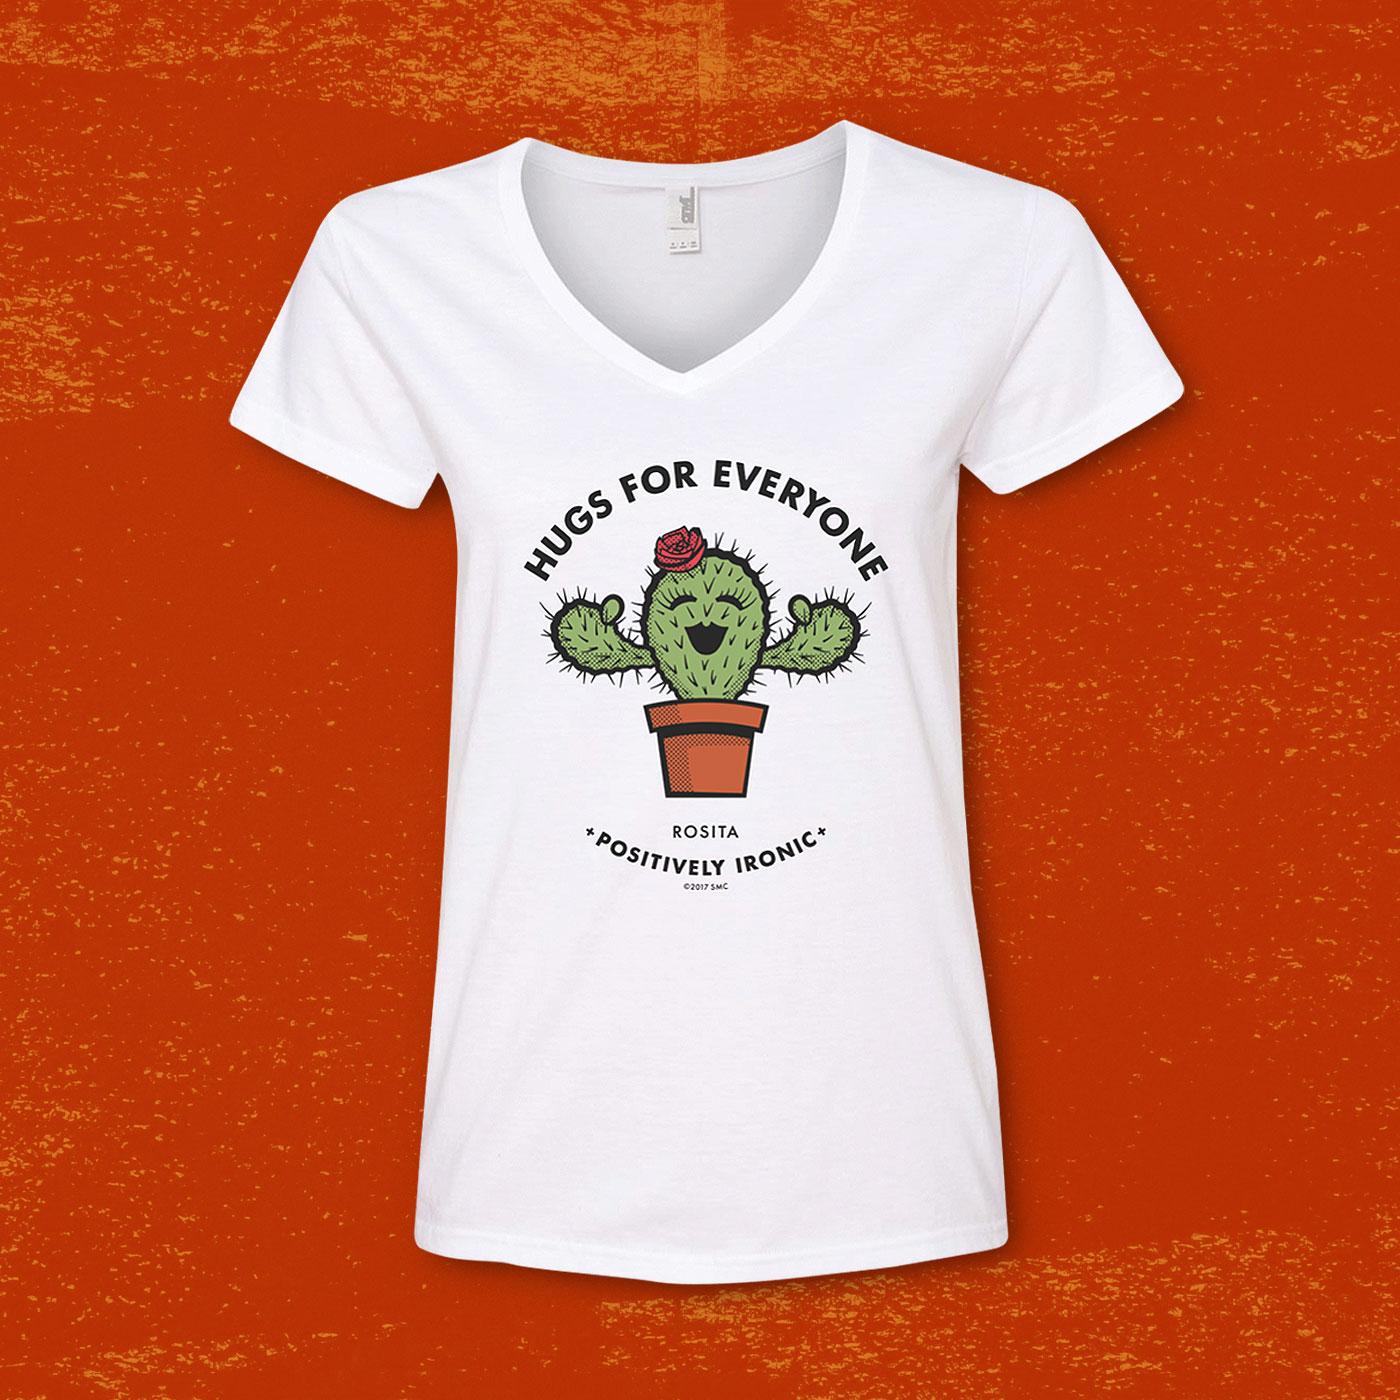 Rosita Tshirt Designer Dallas TX